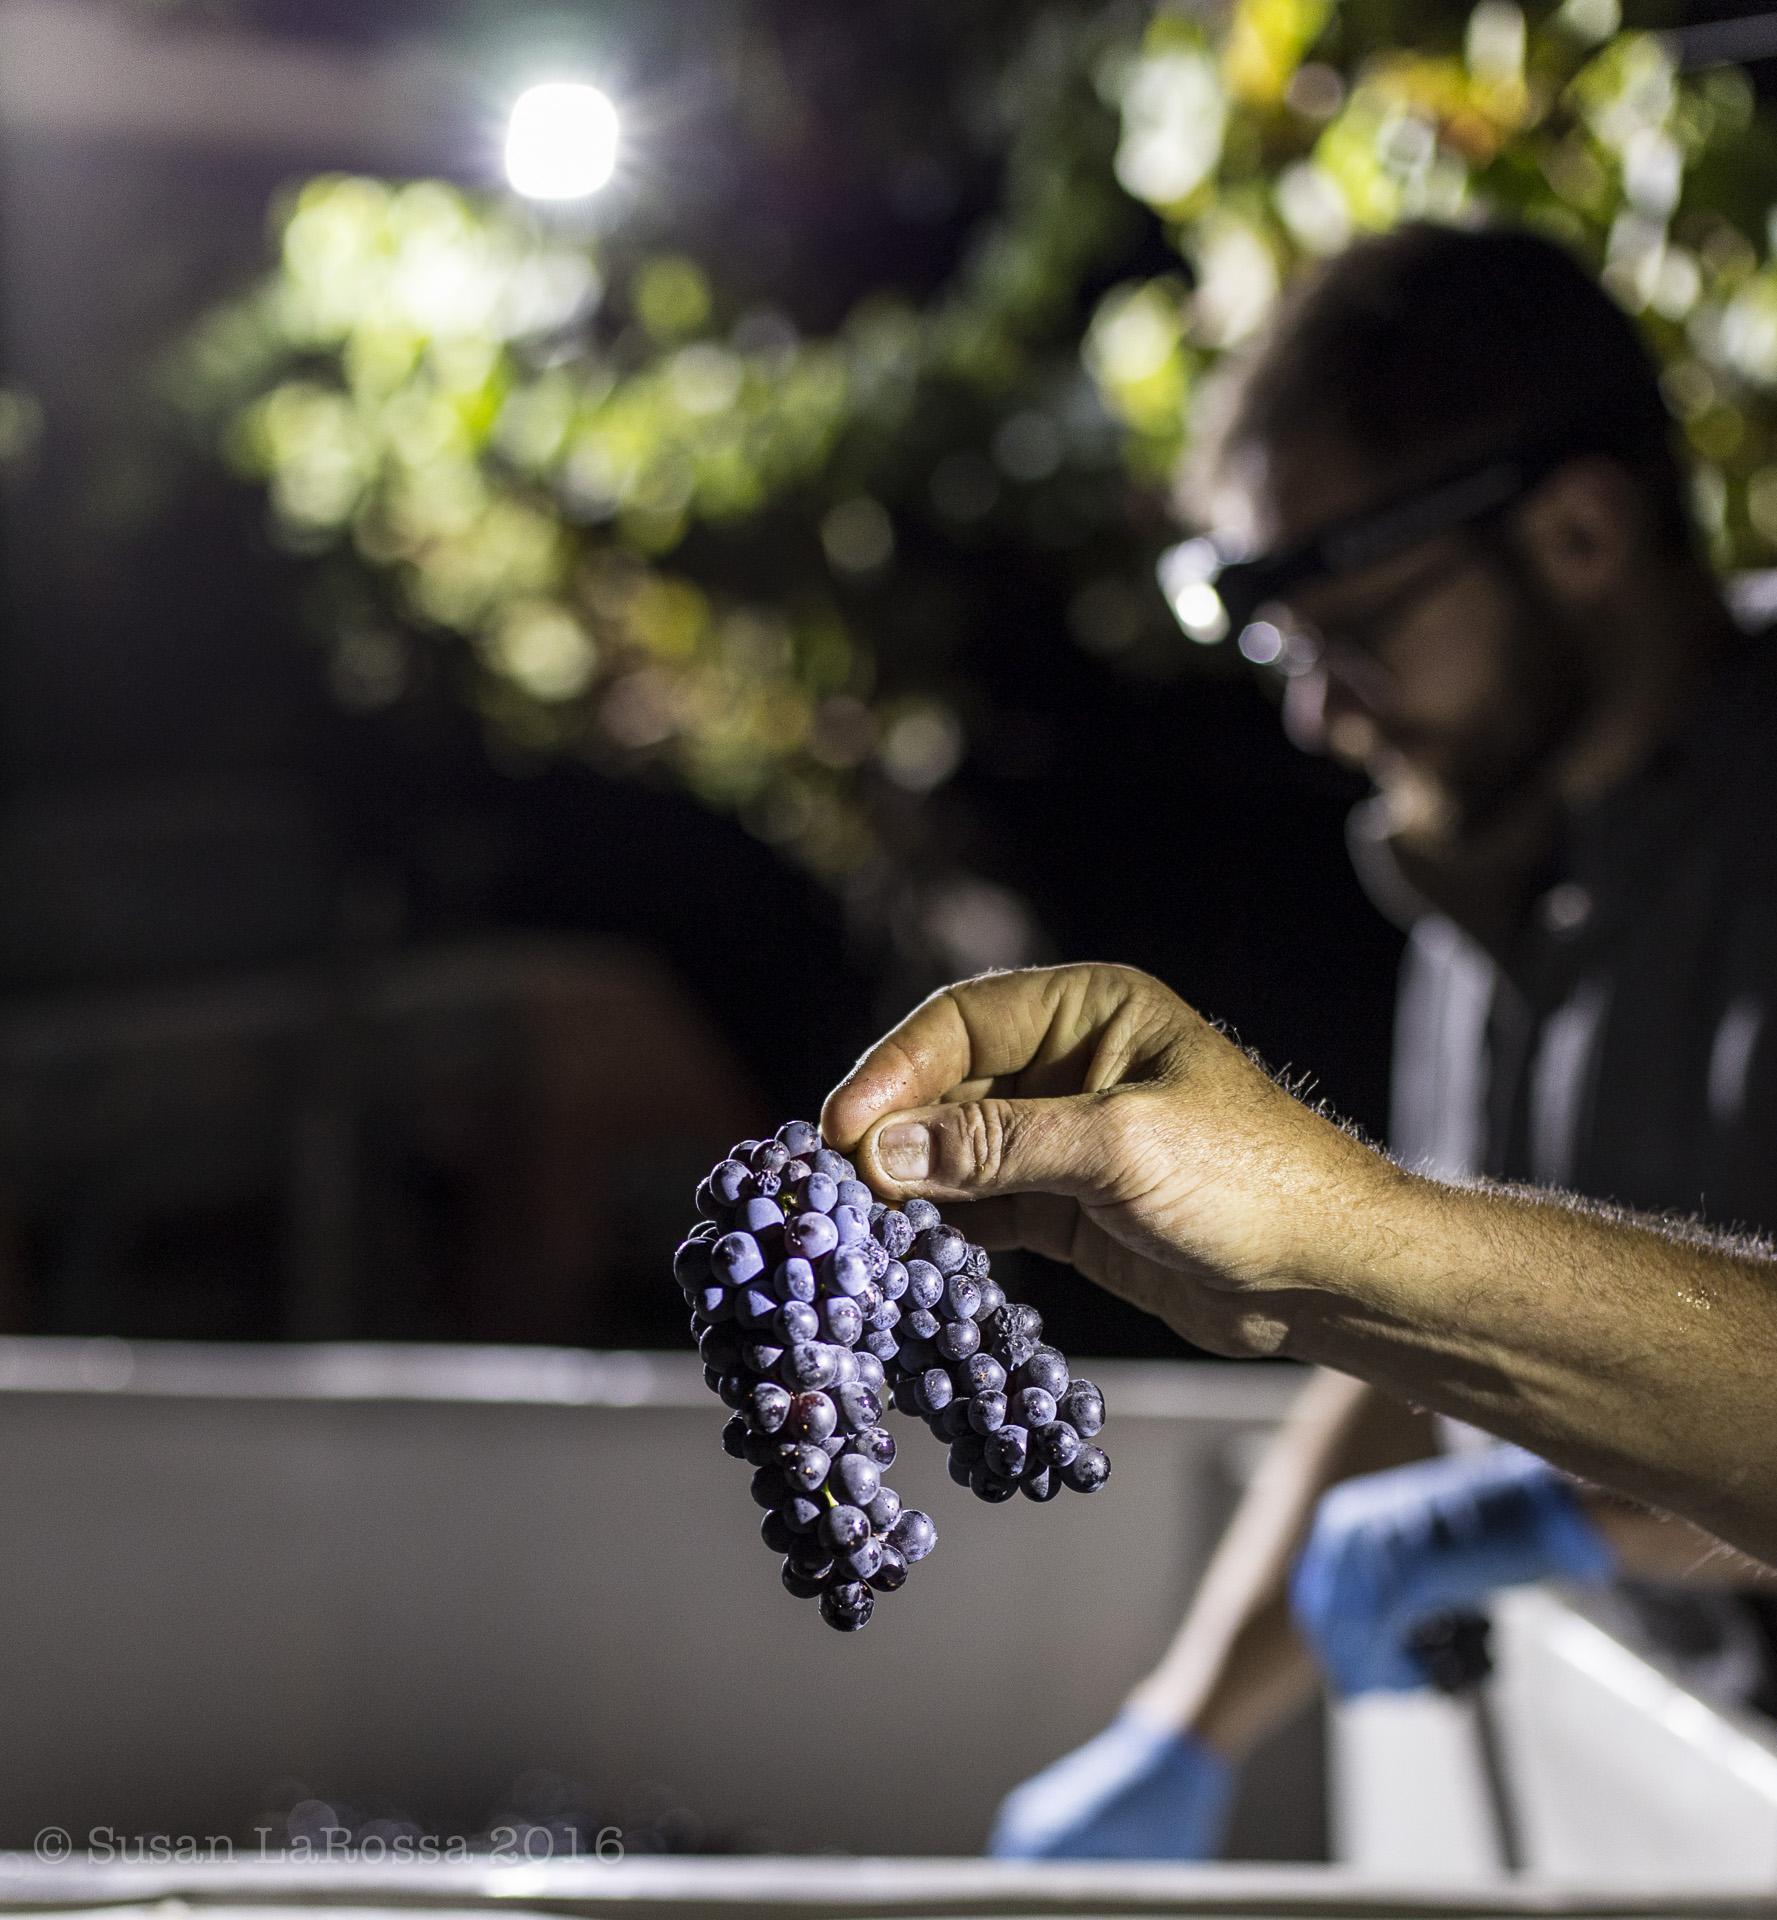 cluster of Pinot Noir, harvested from Rapley Trail Vineyard on September 7, 2016